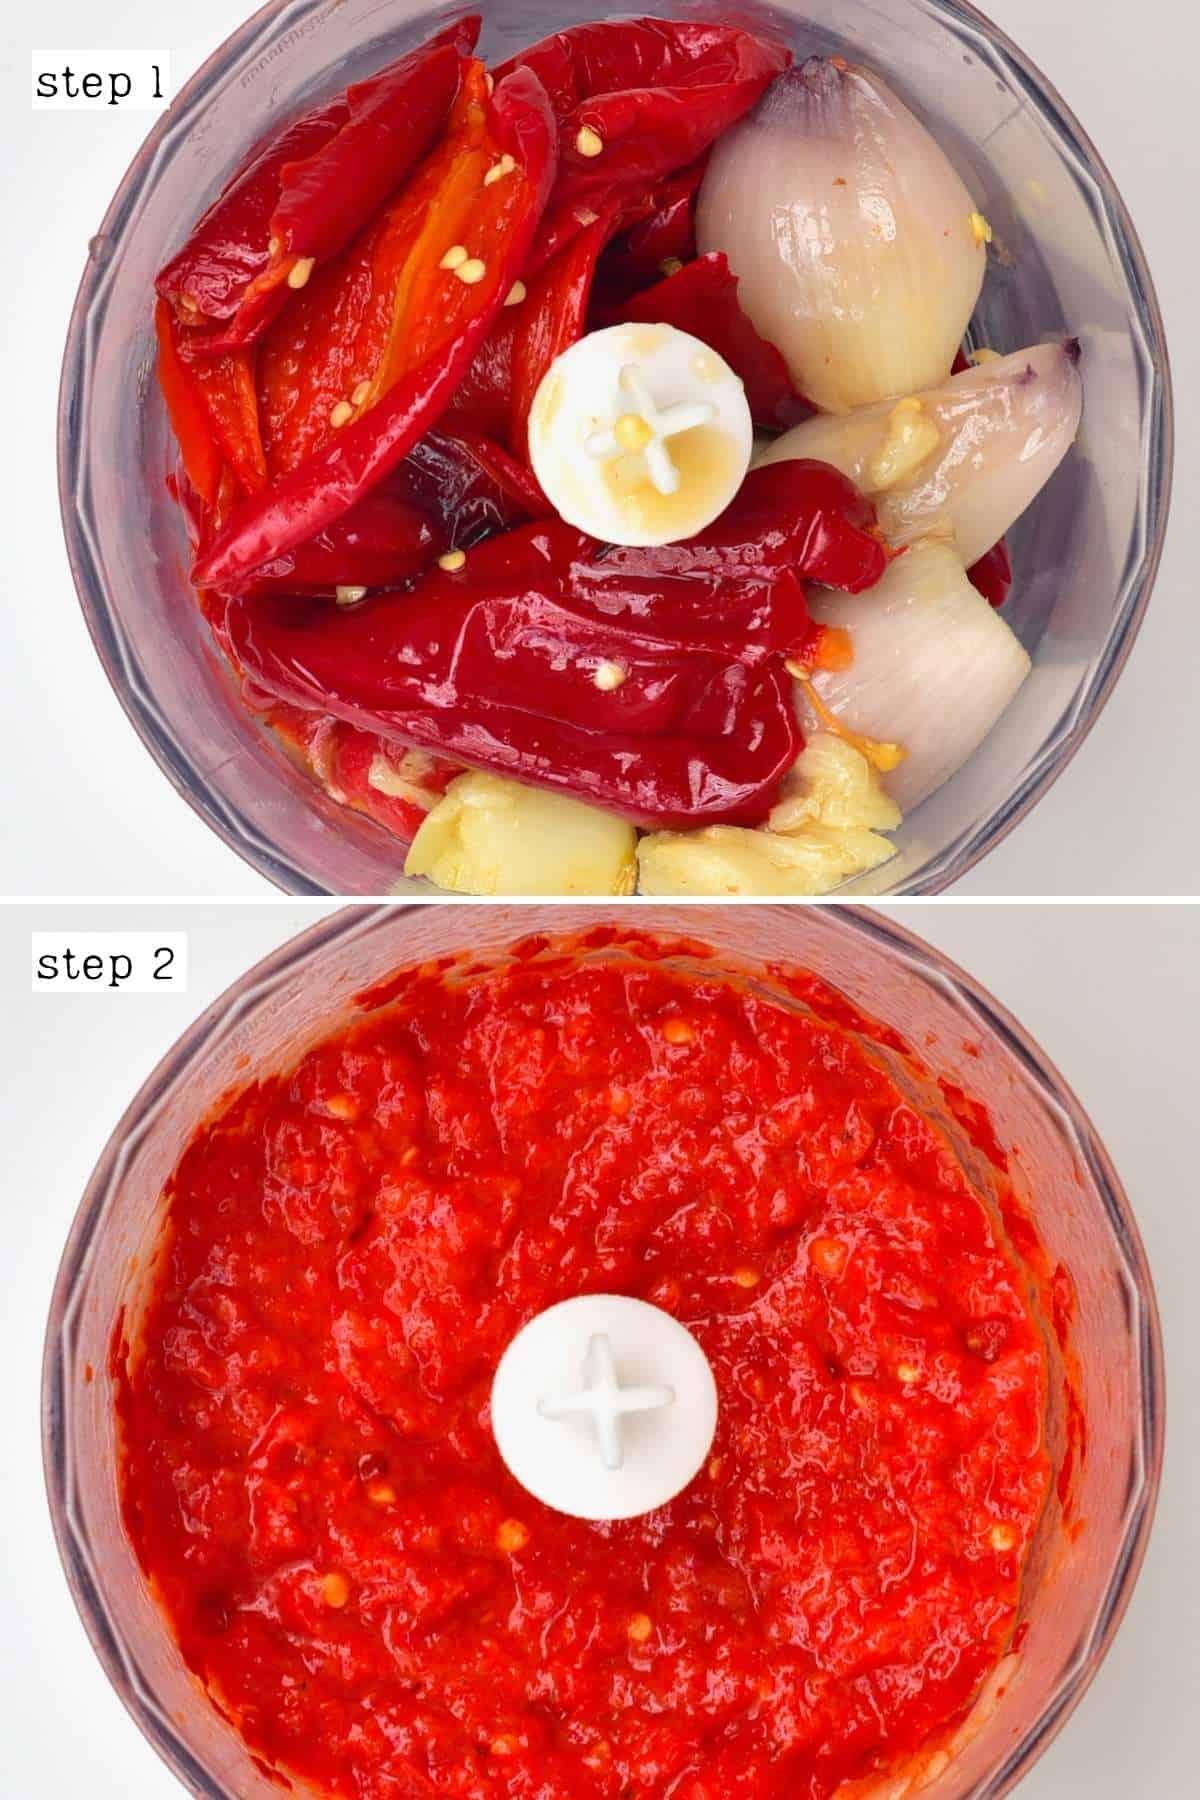 Steps for blending roasted harissa ingredients